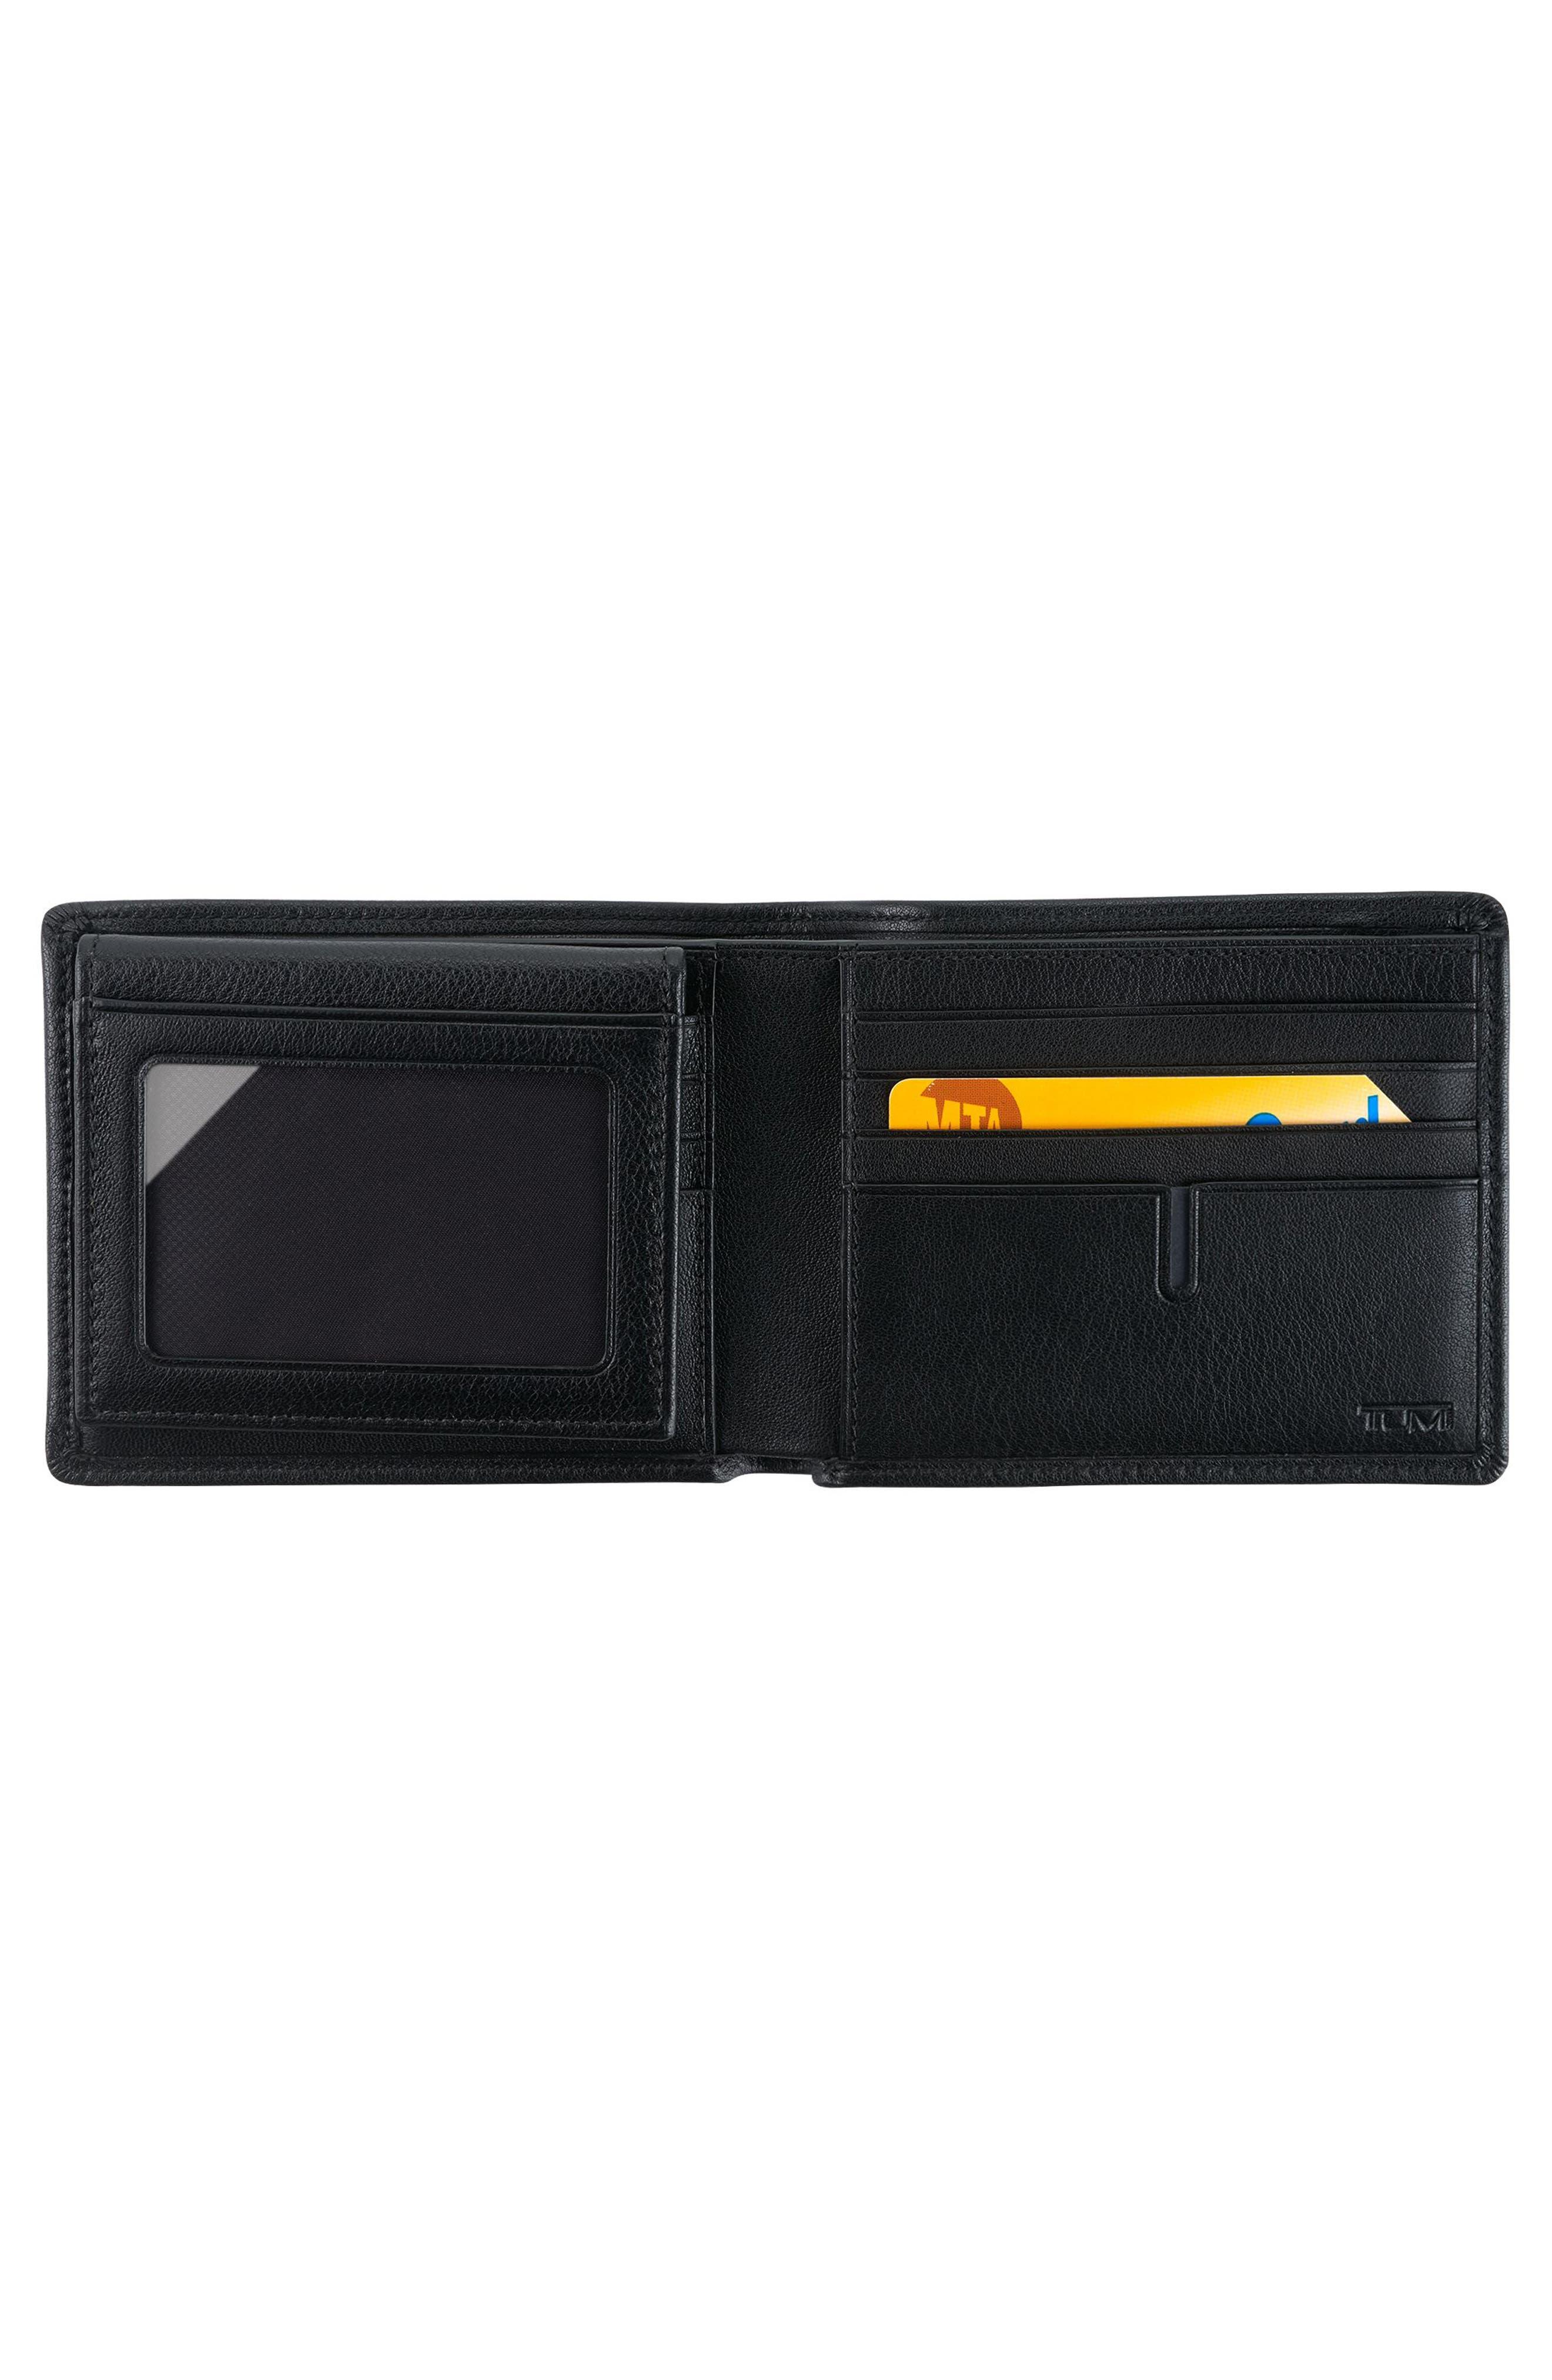 Global Passcase Wallet,                             Alternate thumbnail 2, color,                             011